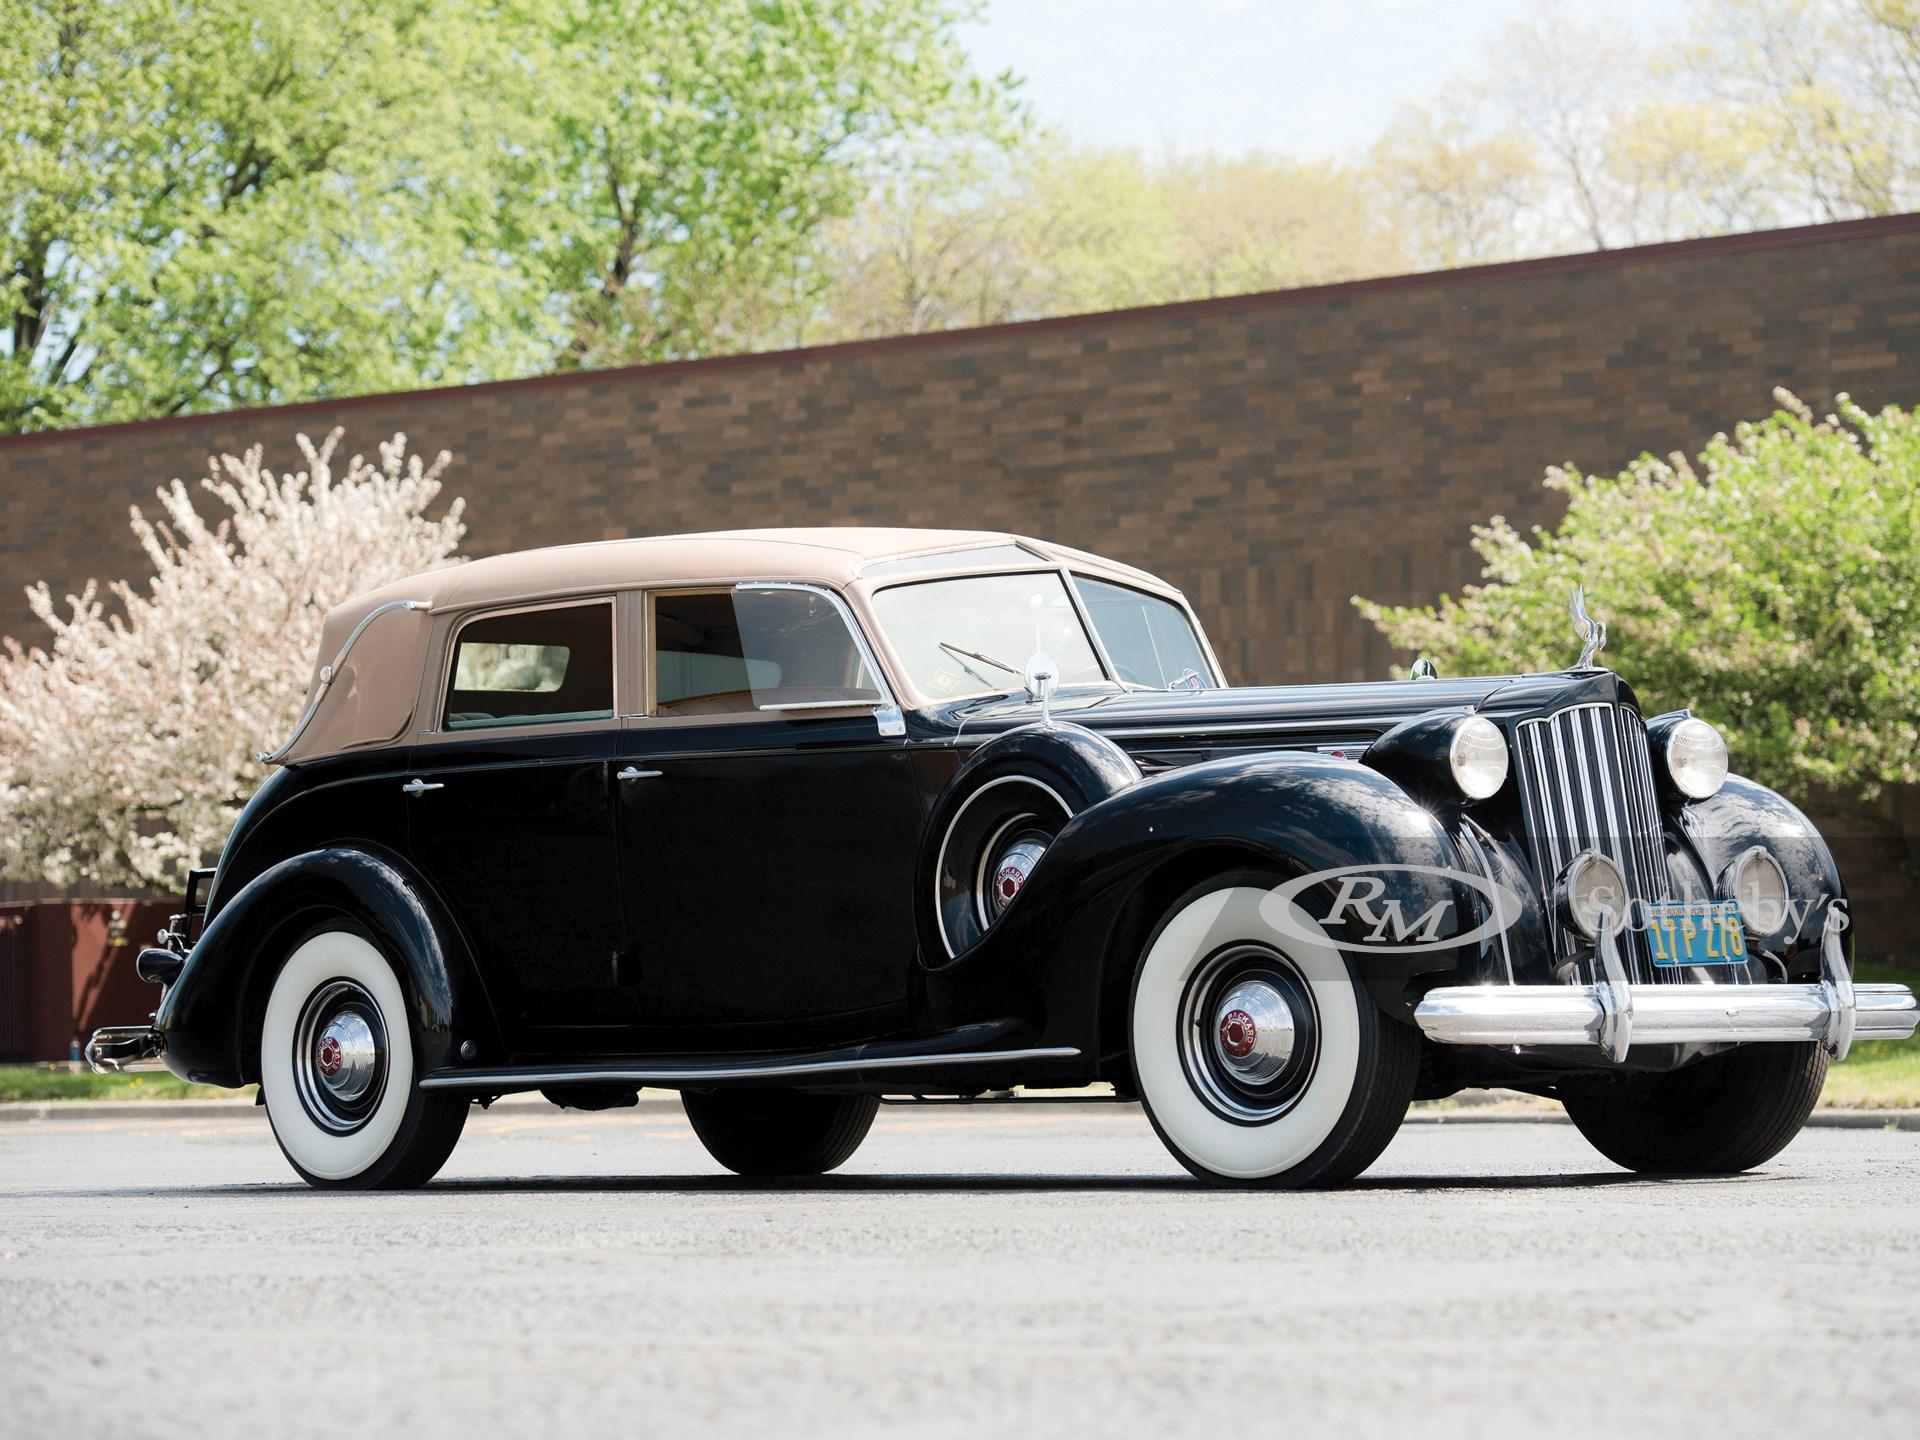 1939 Packard Twelve Touring Cabriolet by Brunn